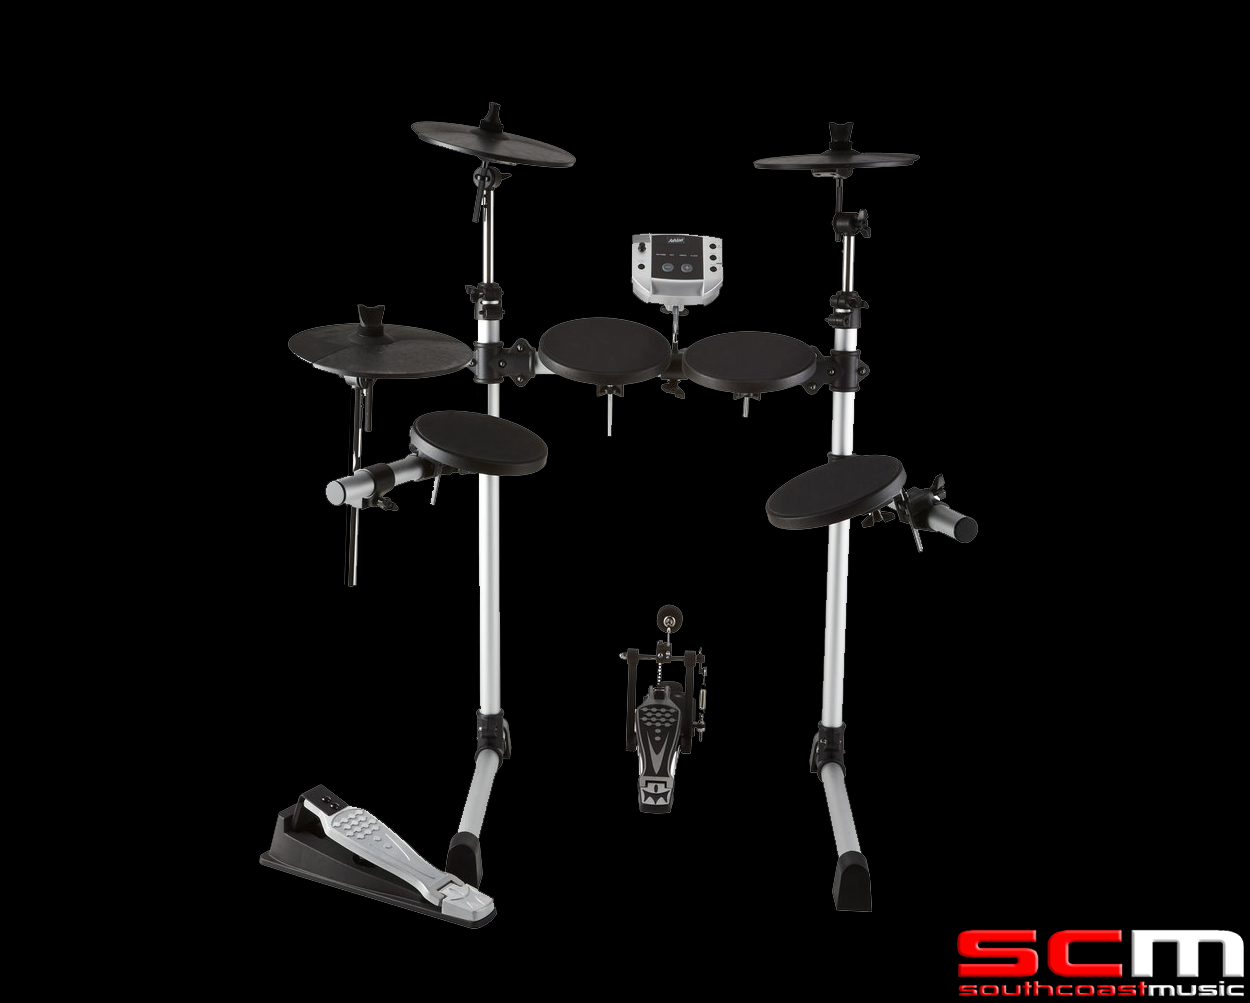 ashton edp420 electronic digital drum kit review